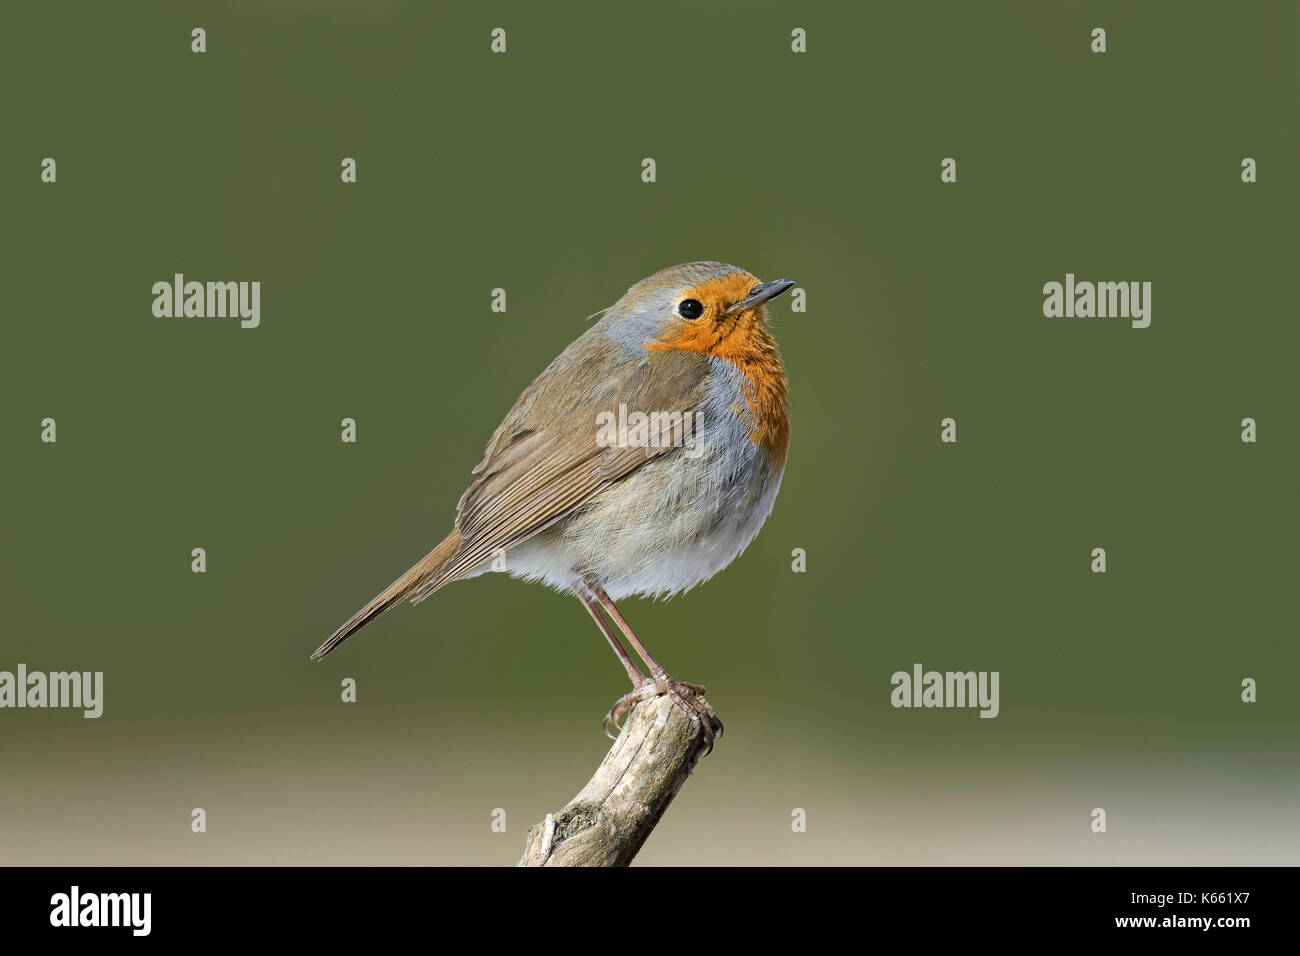 bird feeder, birdfeeder, feeder, winter, peanuts, nuts, food, feeding, eat, eating - Stock Image